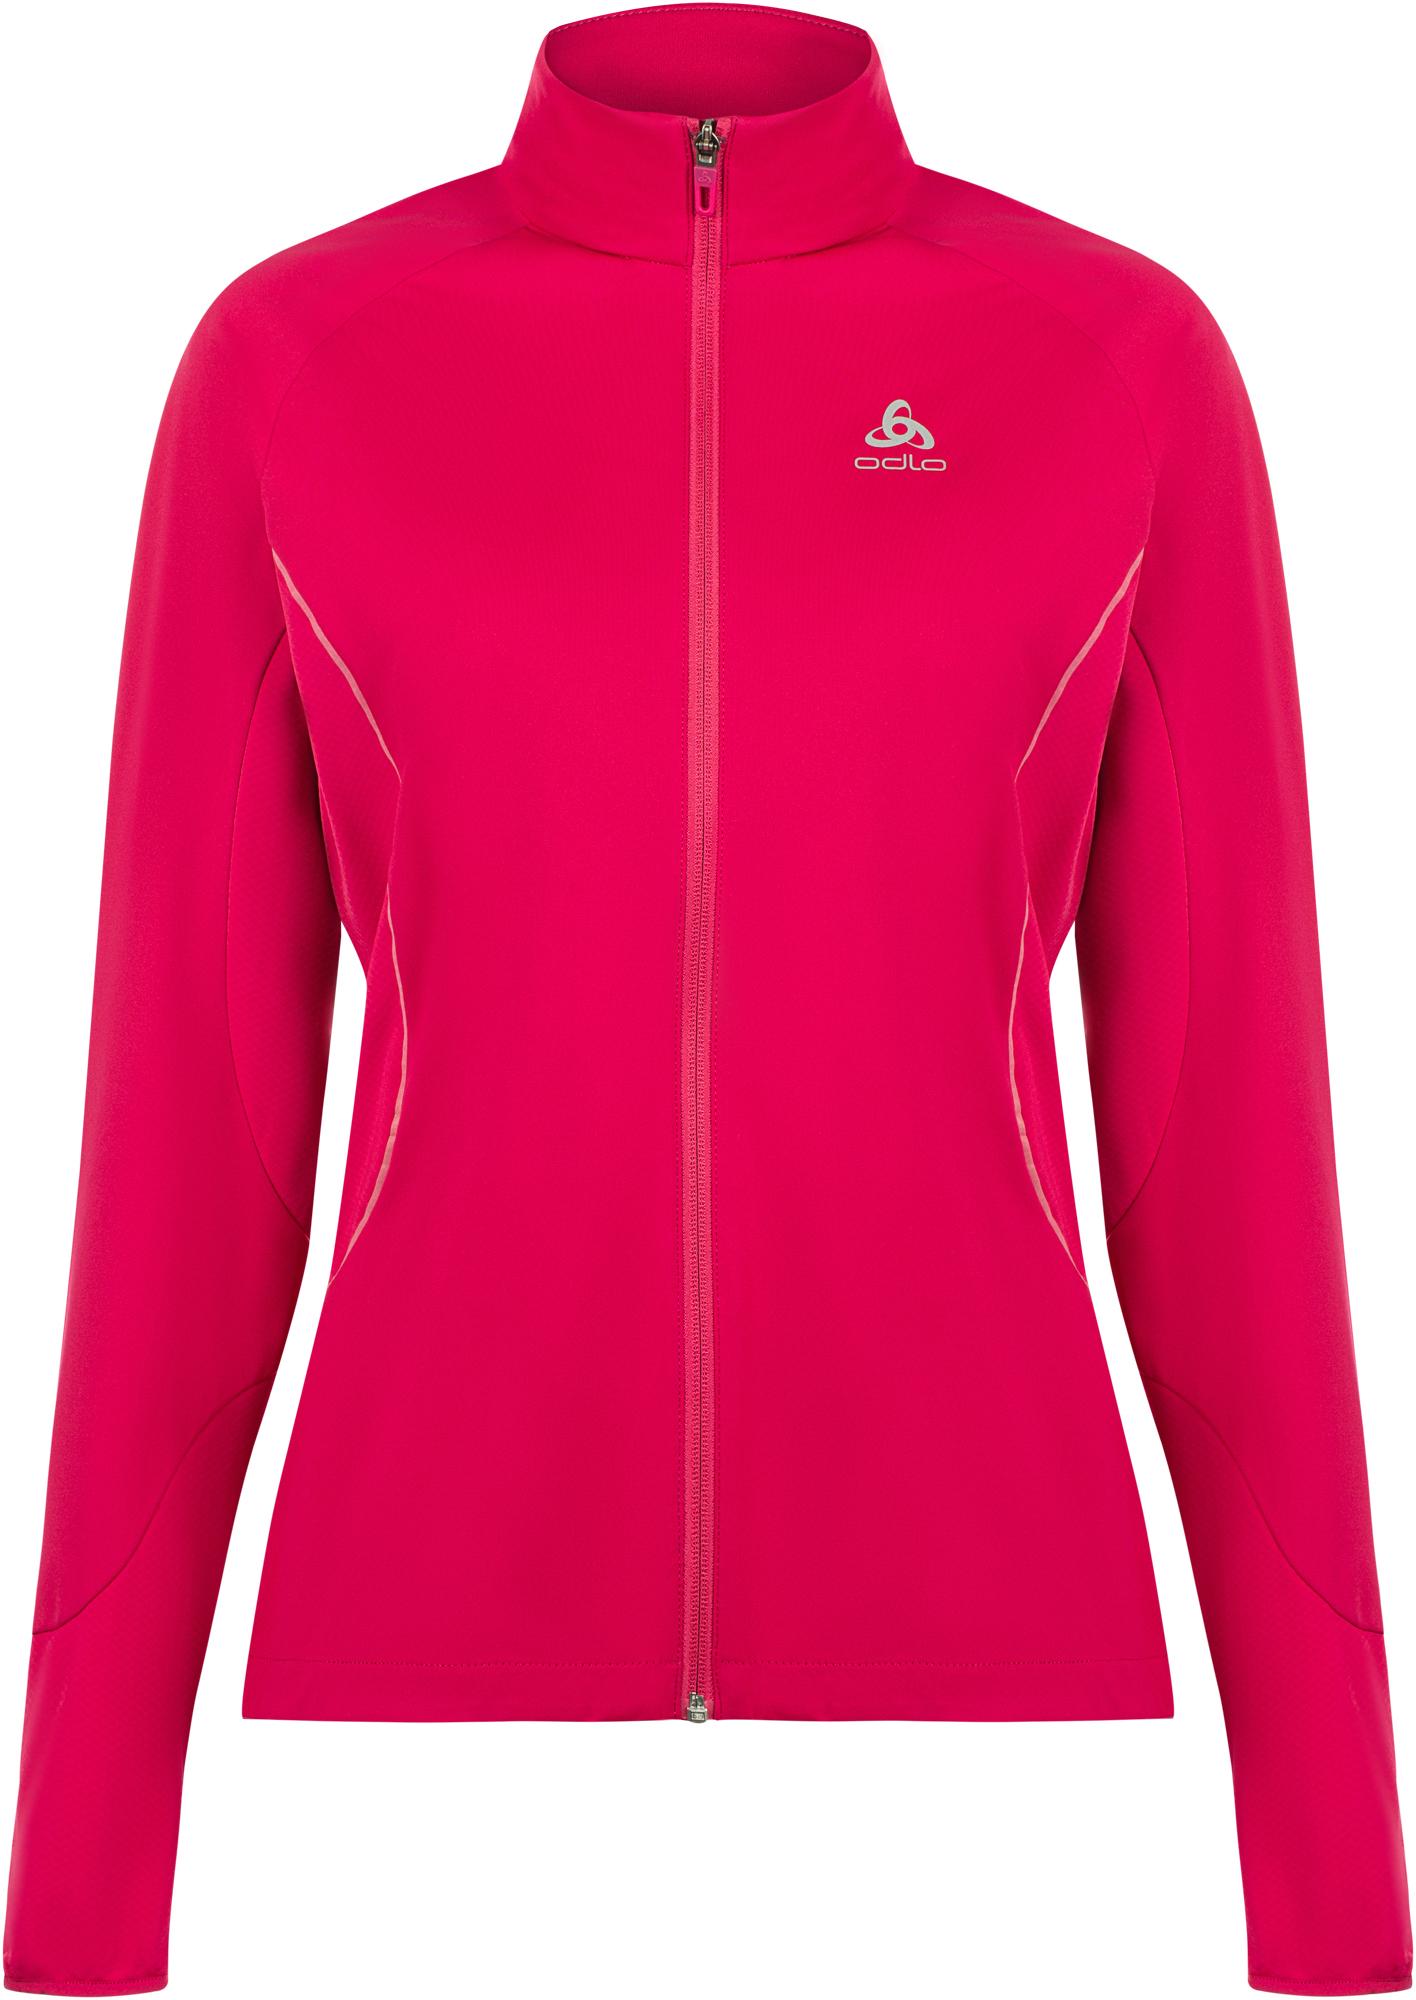 Odlo Куртка женская Odlo Zeroweight, размер 46-48 odlo футболка женская odlo millennium размер 46 48